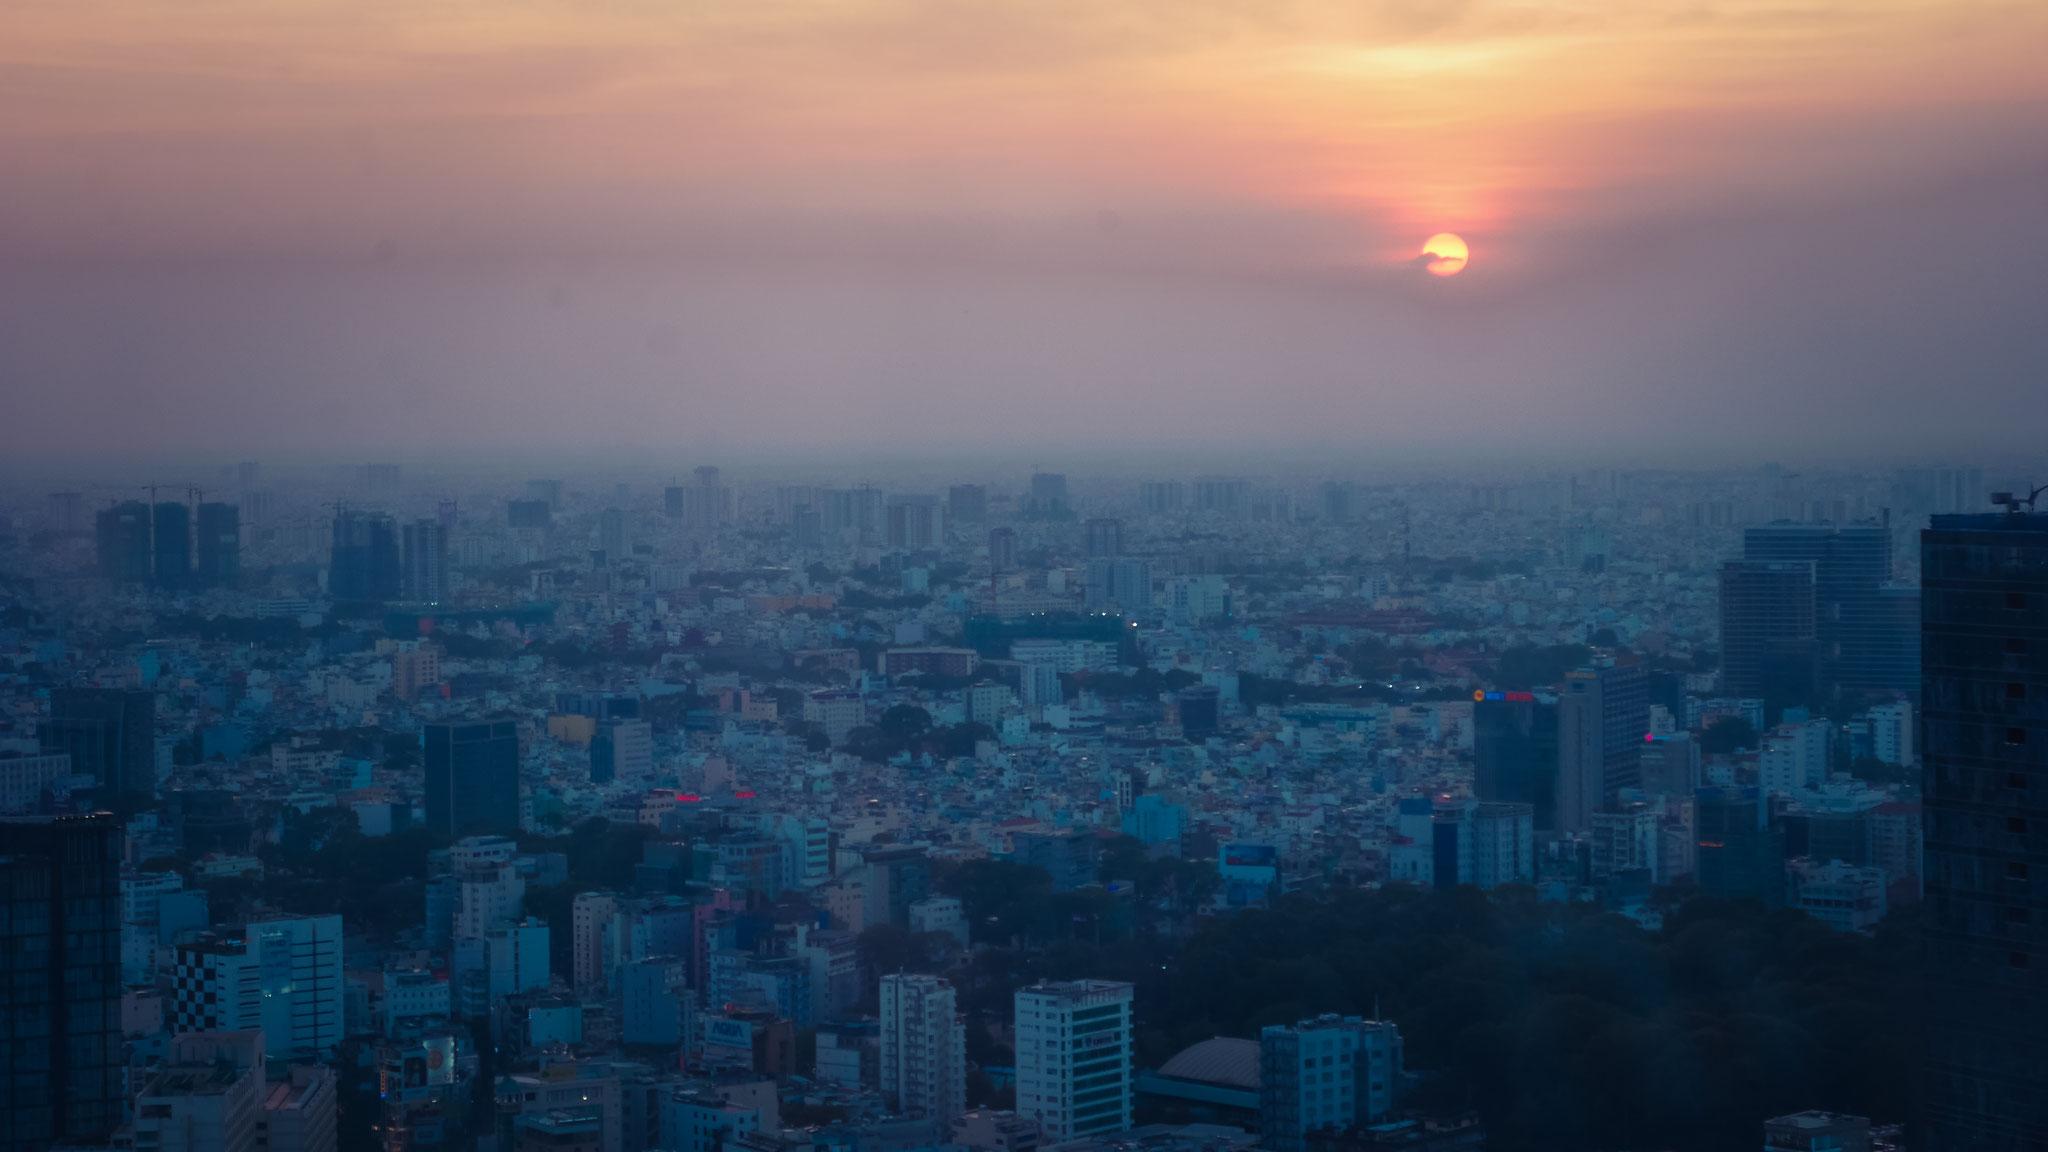 Bitexco Financial Tower - Saigon Skydeck